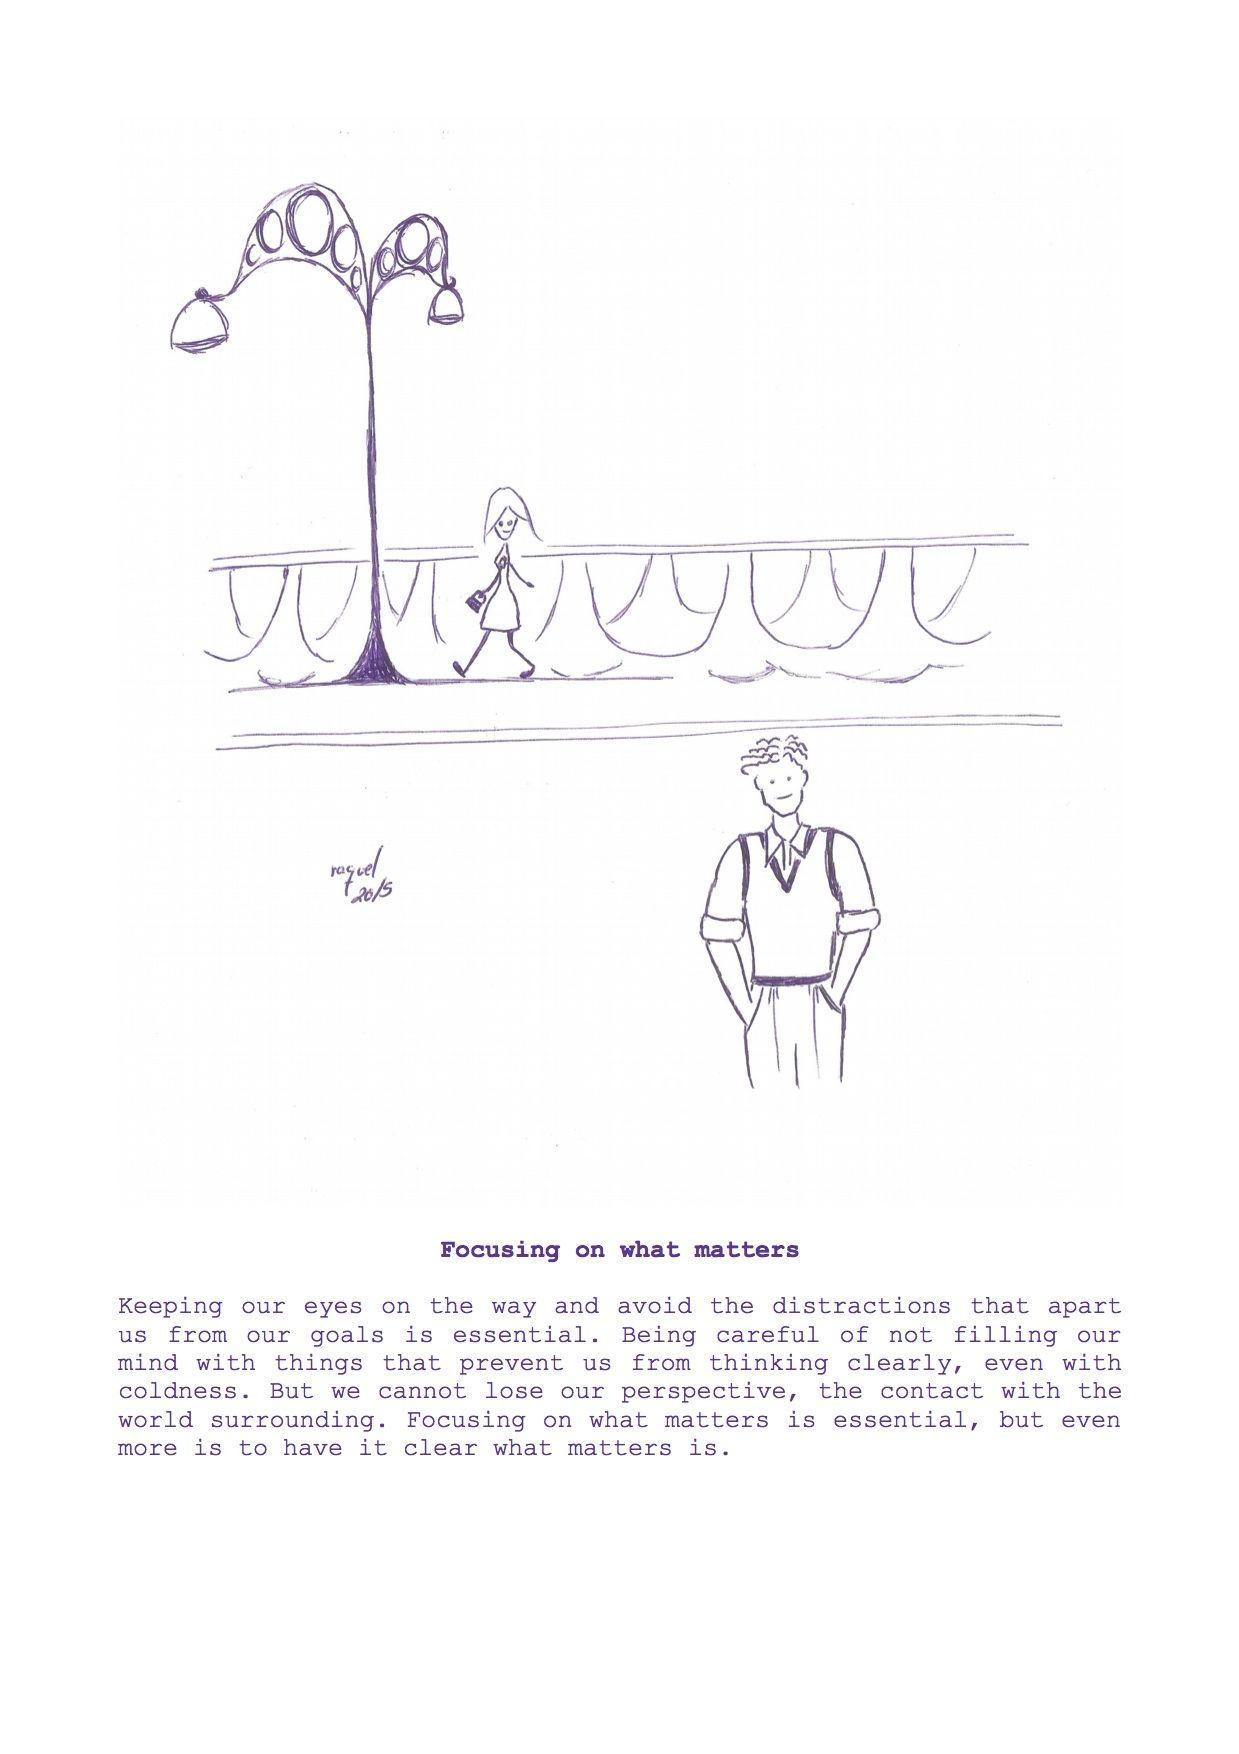 Pin De Raquel Couto Antelo En Short Stories With Art Work